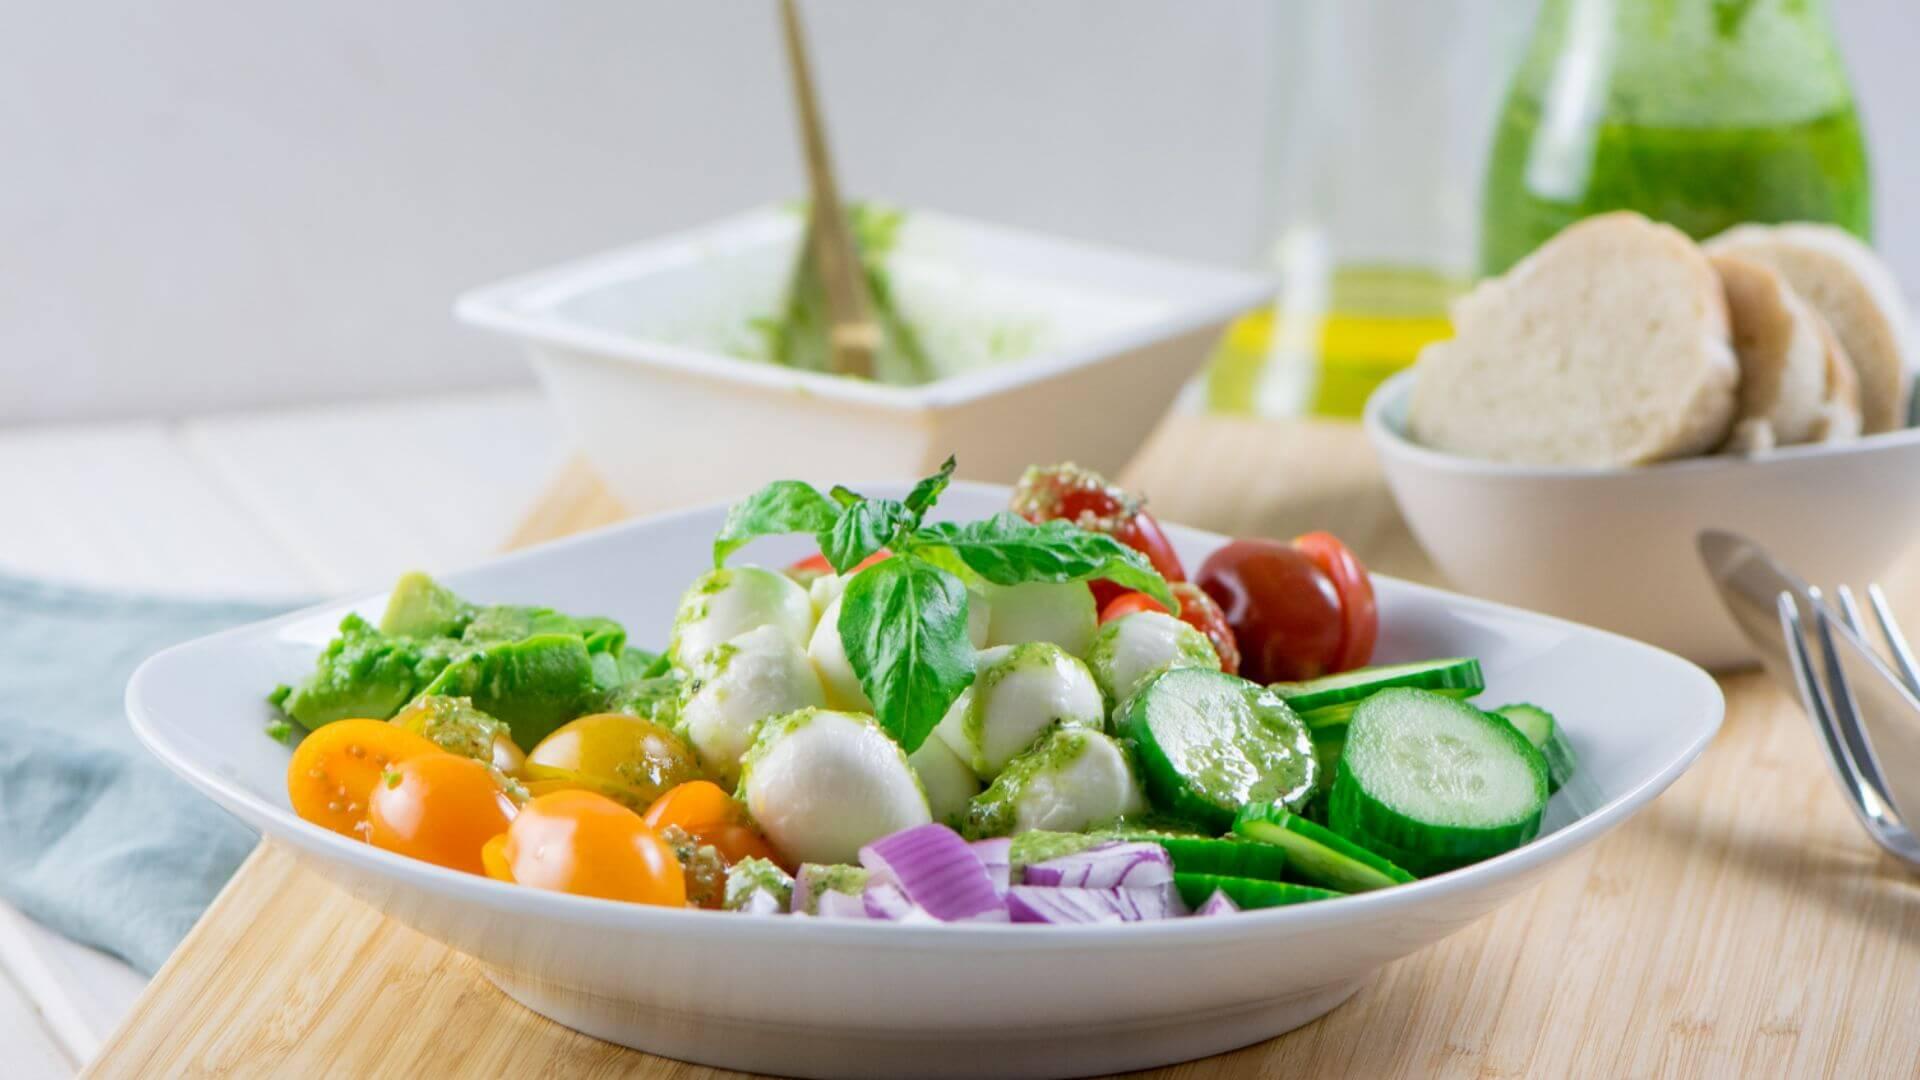 Super leckerer Salat - Avocado Salat mit Mozzarella, Tomate und Pesto Dressing